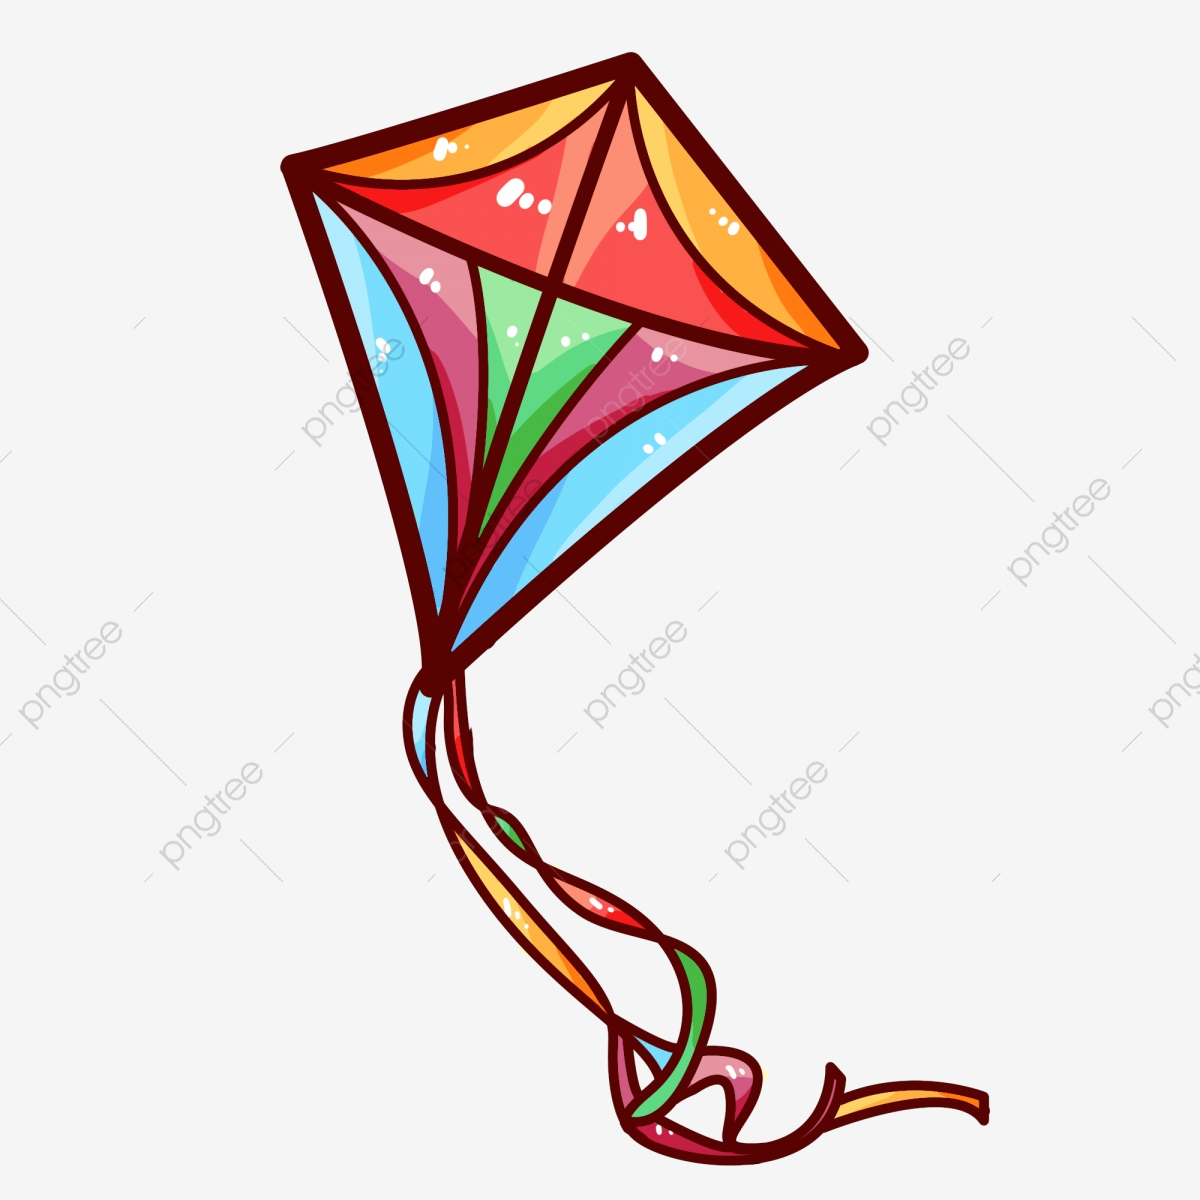 Square illustration hand drawn. Clipart kite diamond